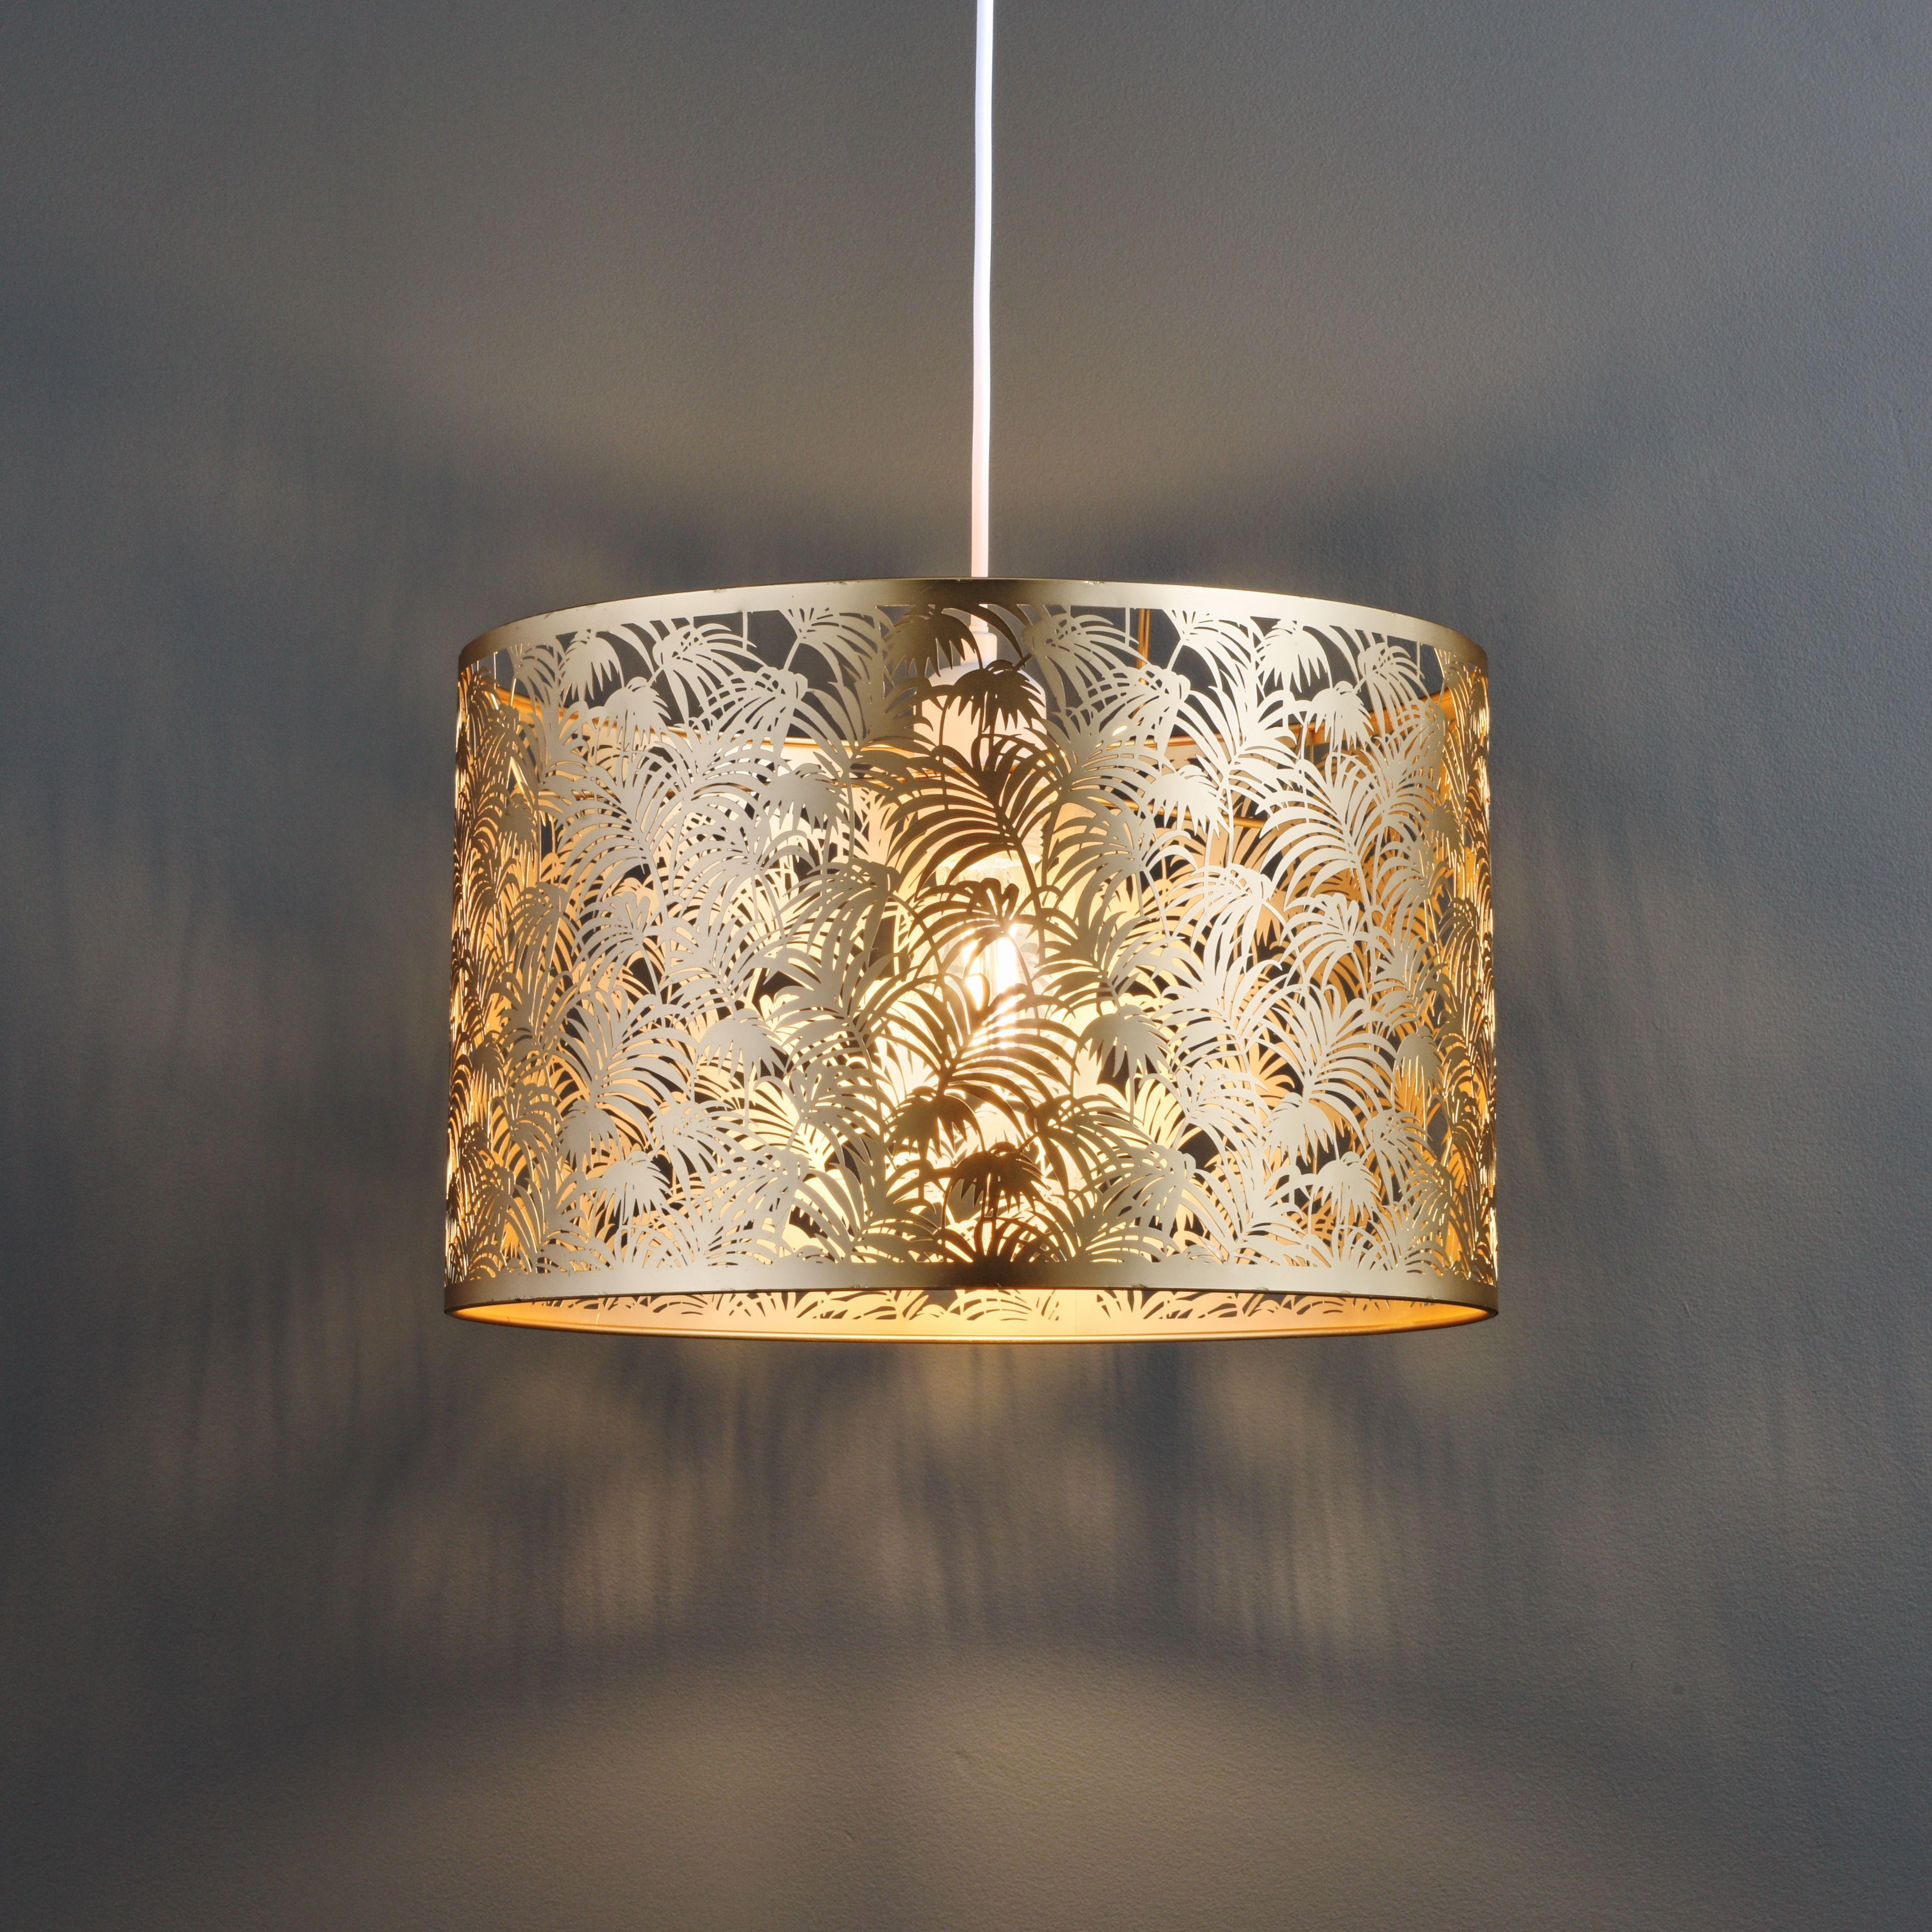 Karmina modern satin rose gold effect light shade from B&Q\'s latest ...